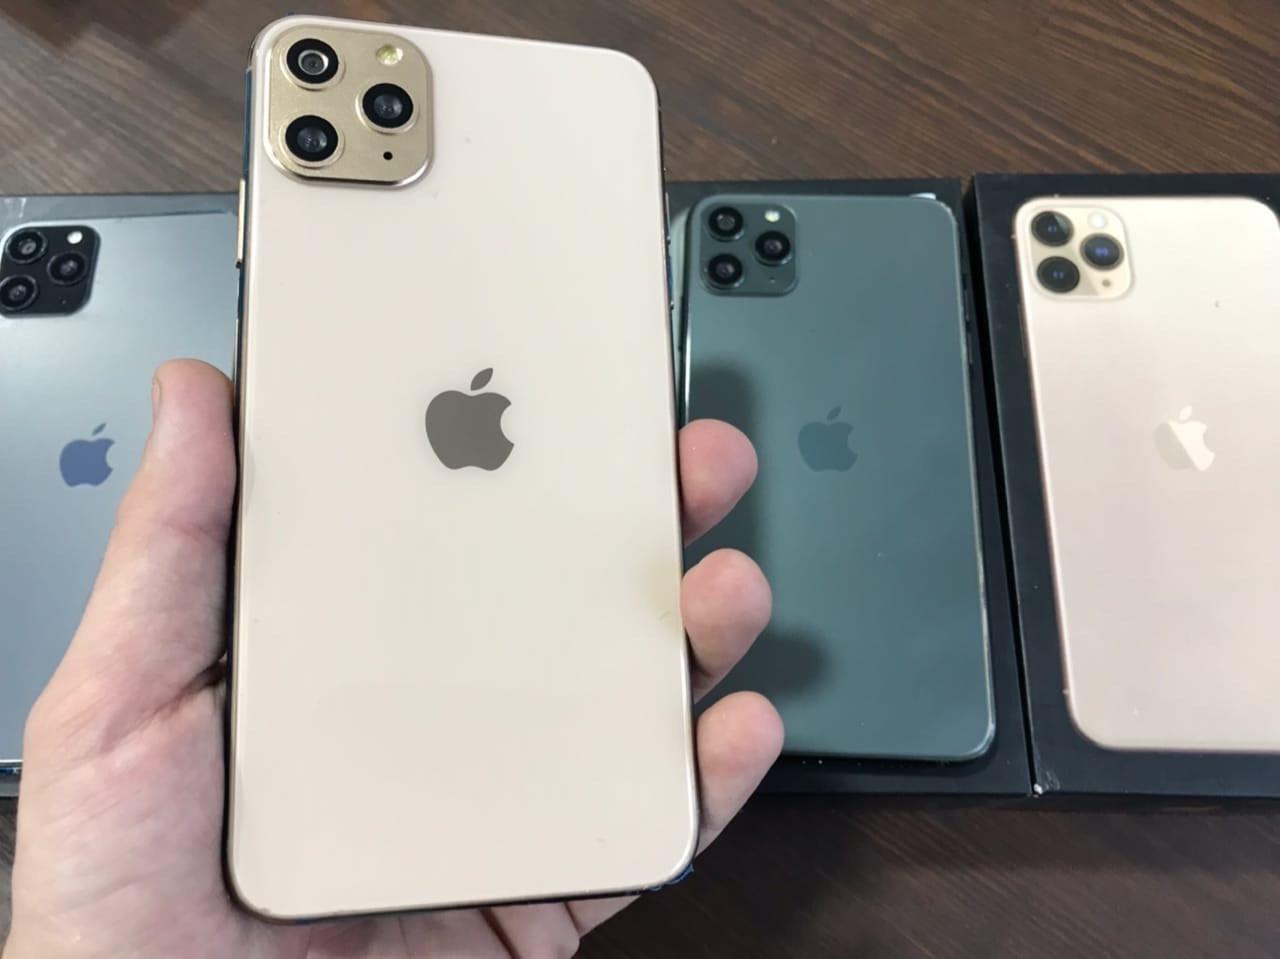 "Официальная Реплика Apple Iphone 11 Pro Max 6.5"" 128Gb +ПОДАРОК: ЧЕХОЛ+СТЕКЛО Айфон 11 Про Макс"